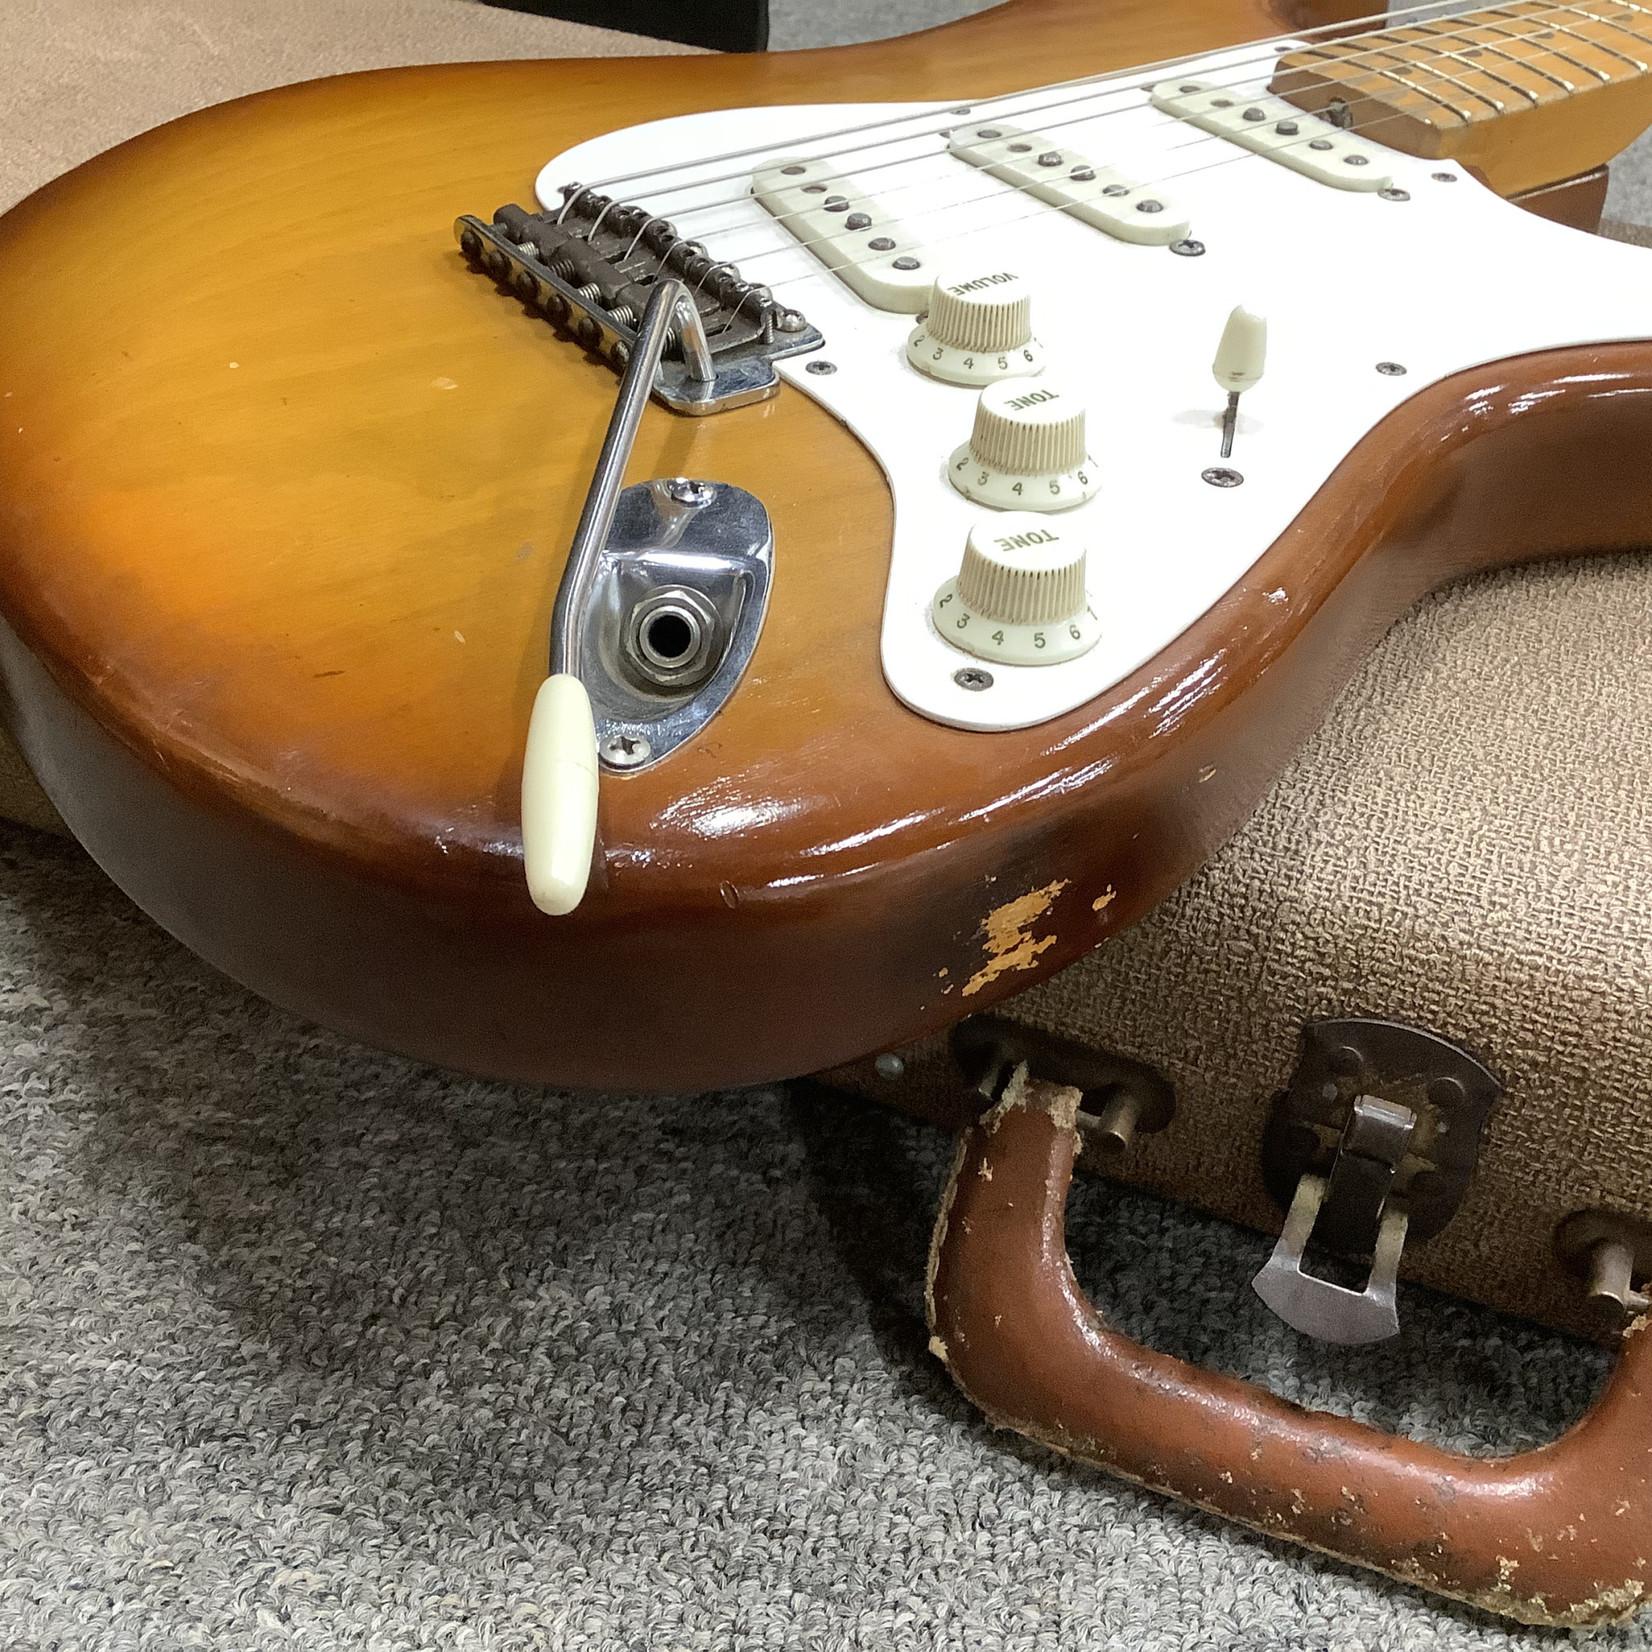 Fender 1954 Fender Stratocaster Refinished, Refretted